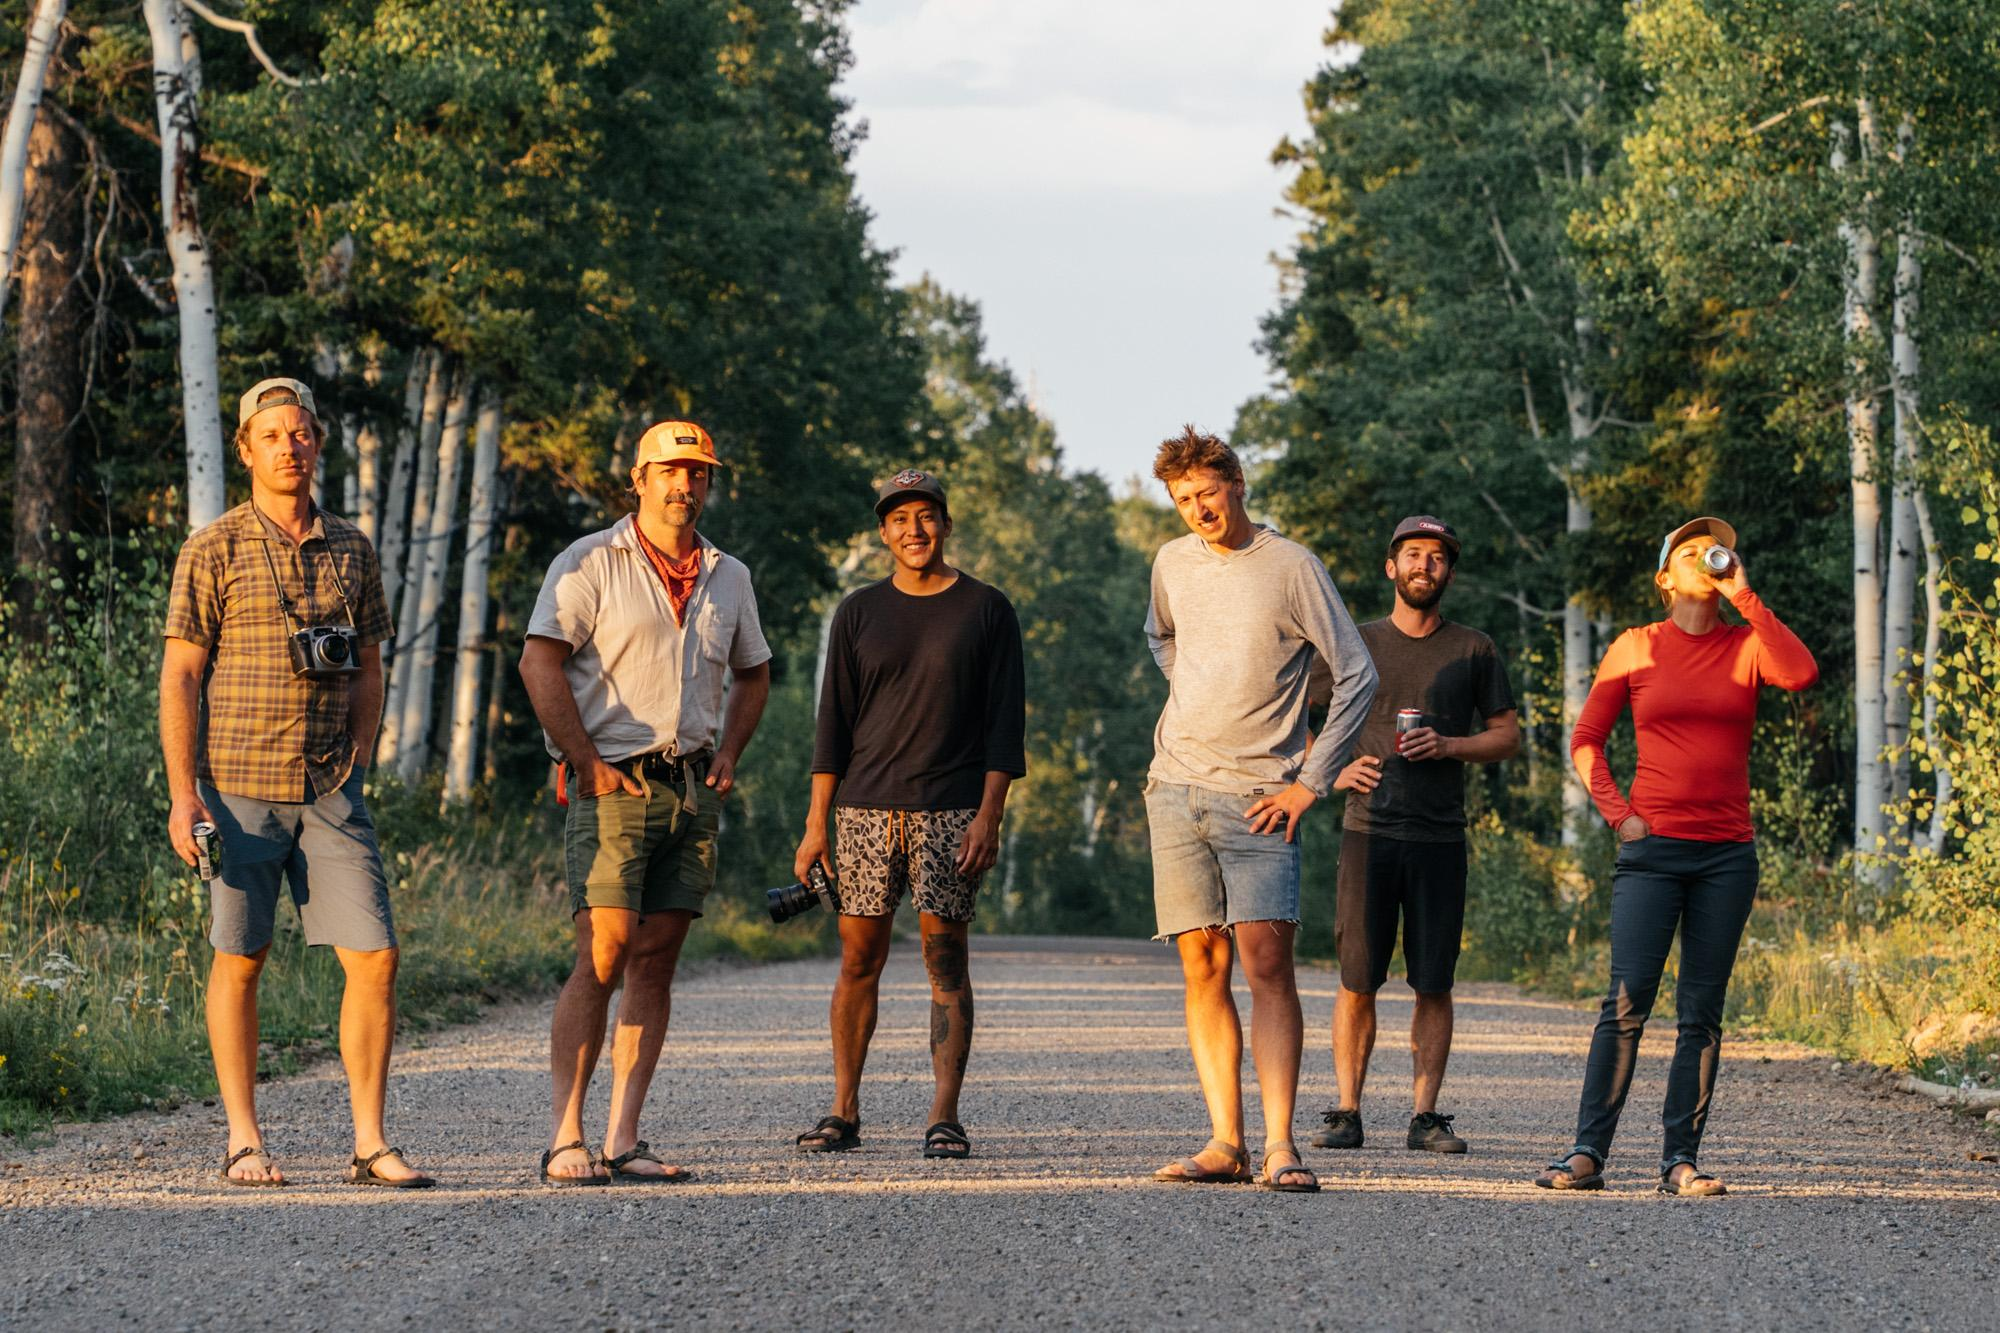 Crew (minus Bryan)